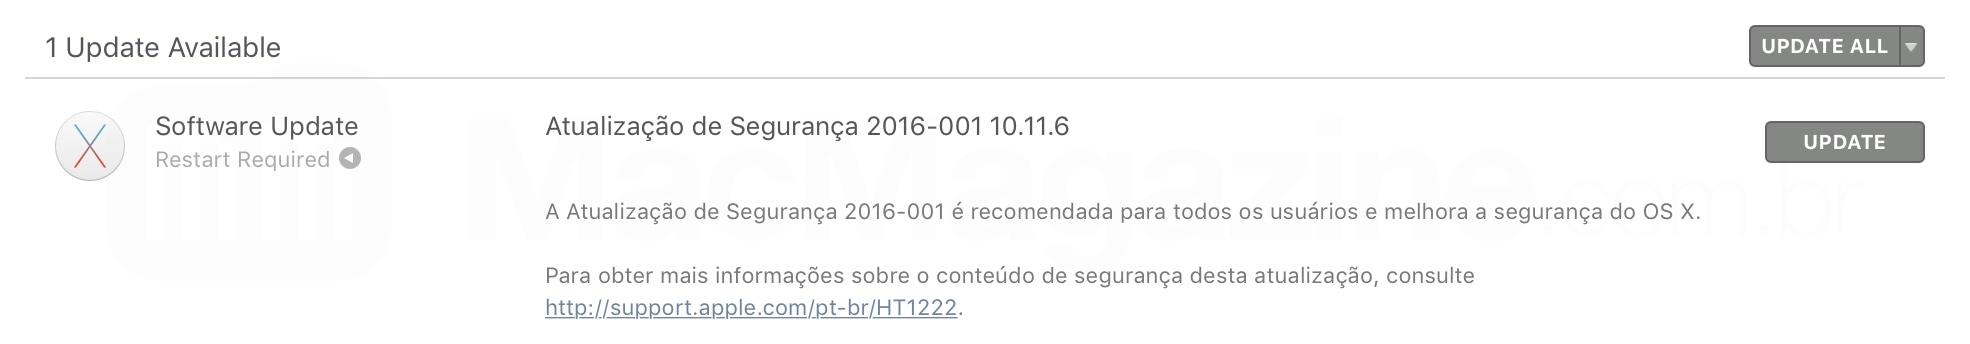 Update de segurança para o OS X El Capitan 10.11.6